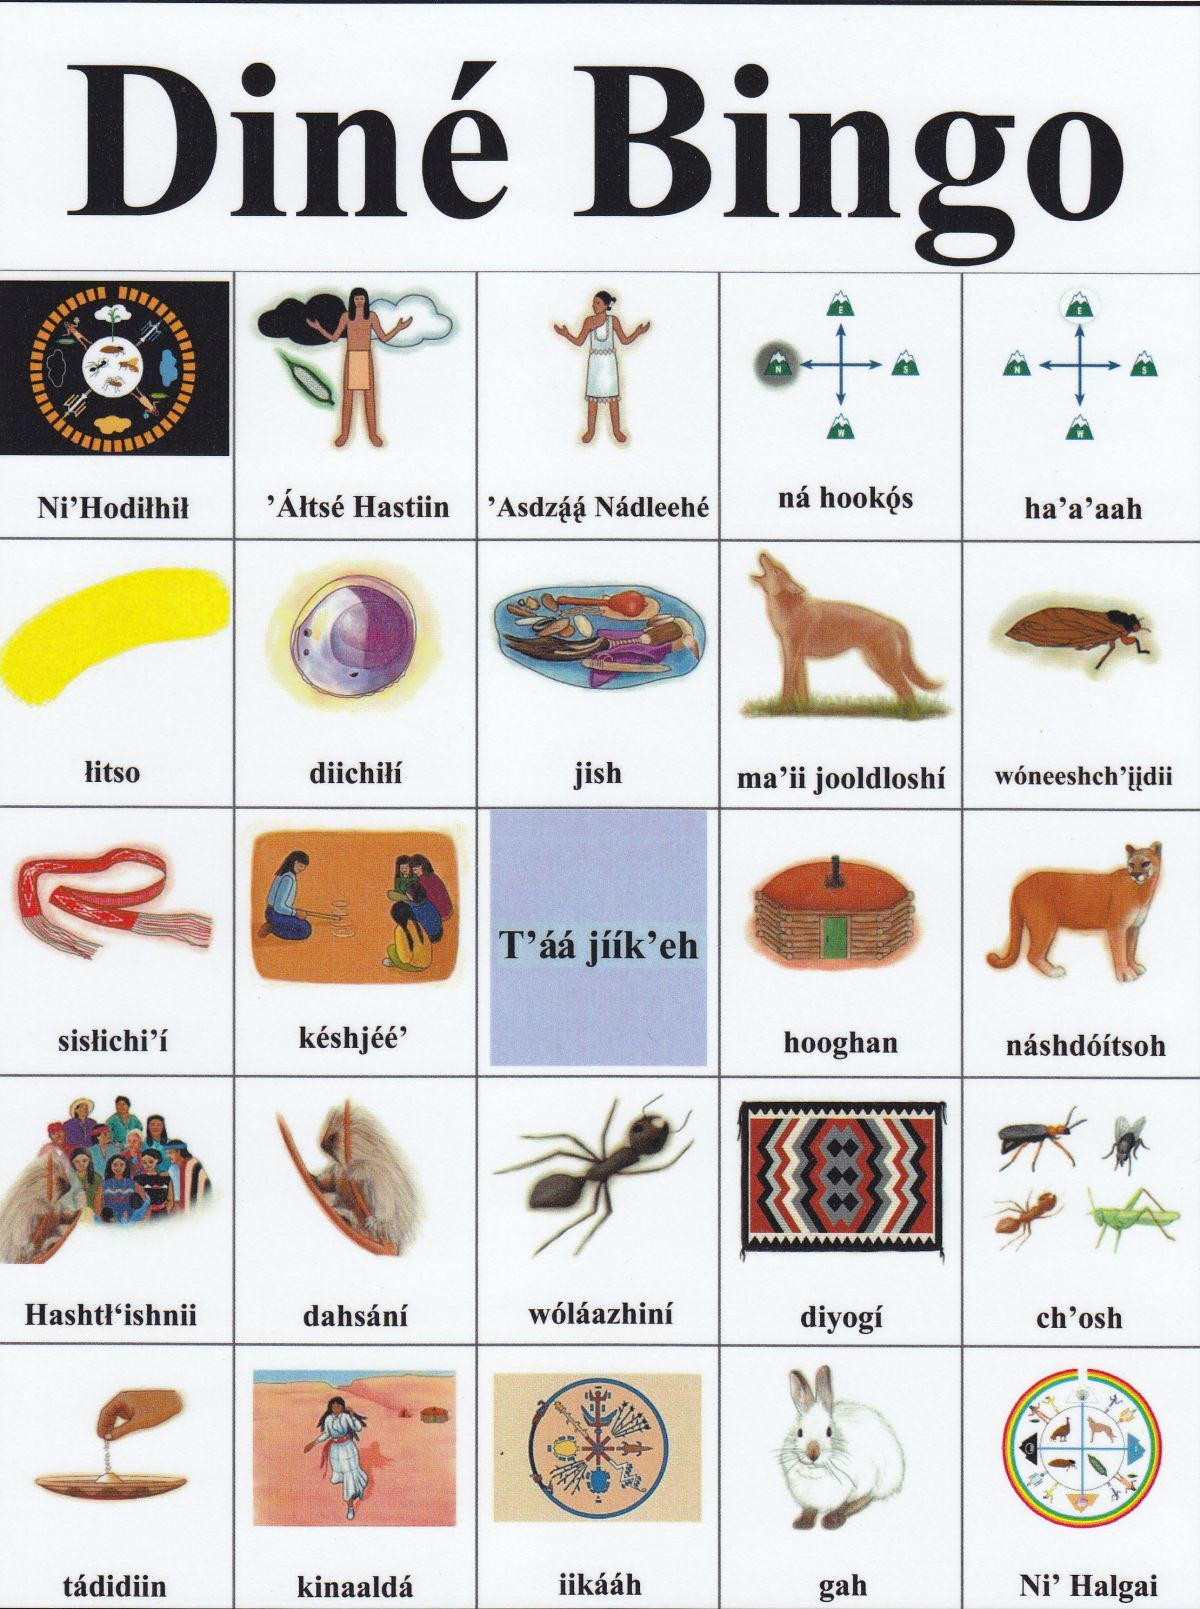 Navajo Clans Names Dine Bingo History Vocabulary List History